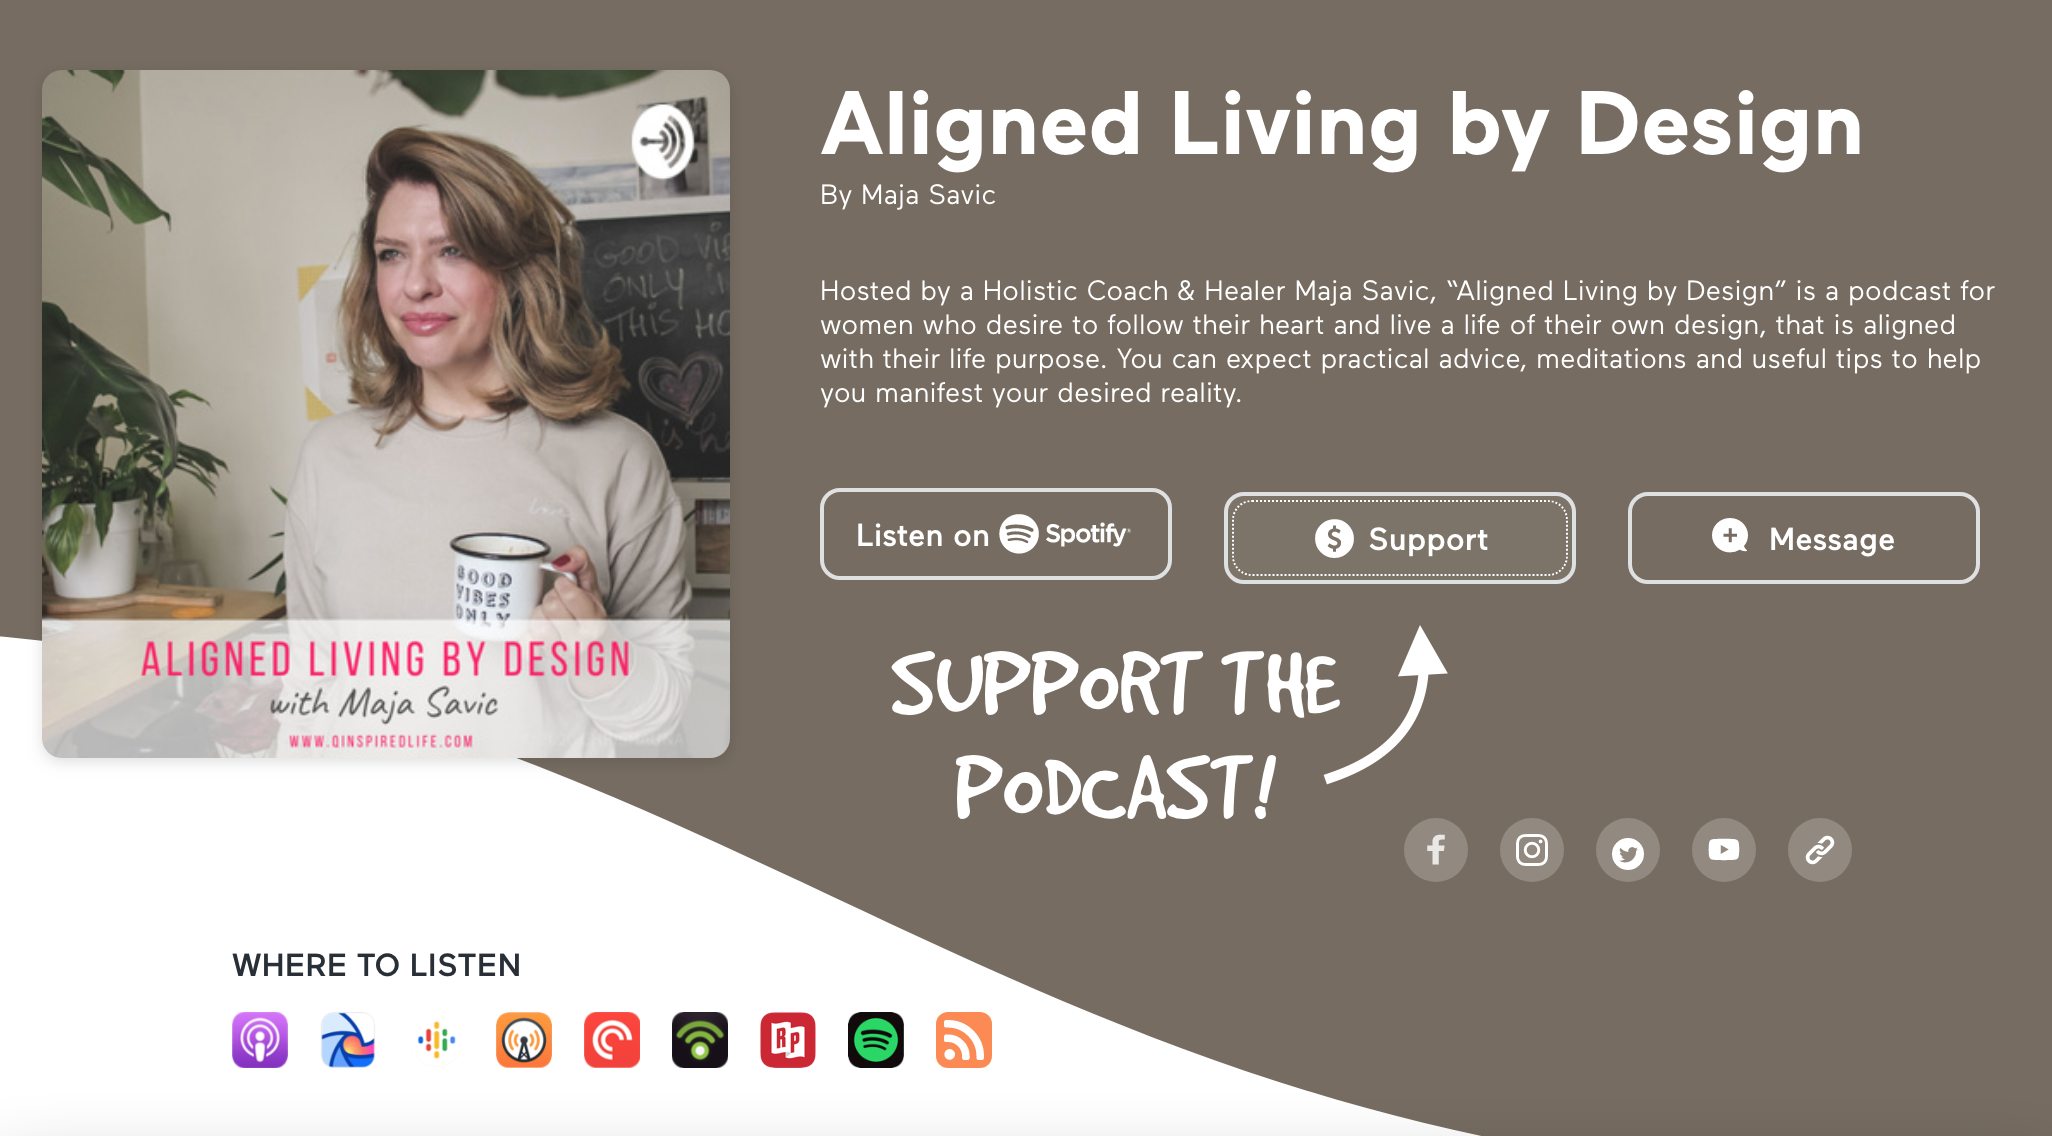 podcast, Aligned Living by Design Podcast